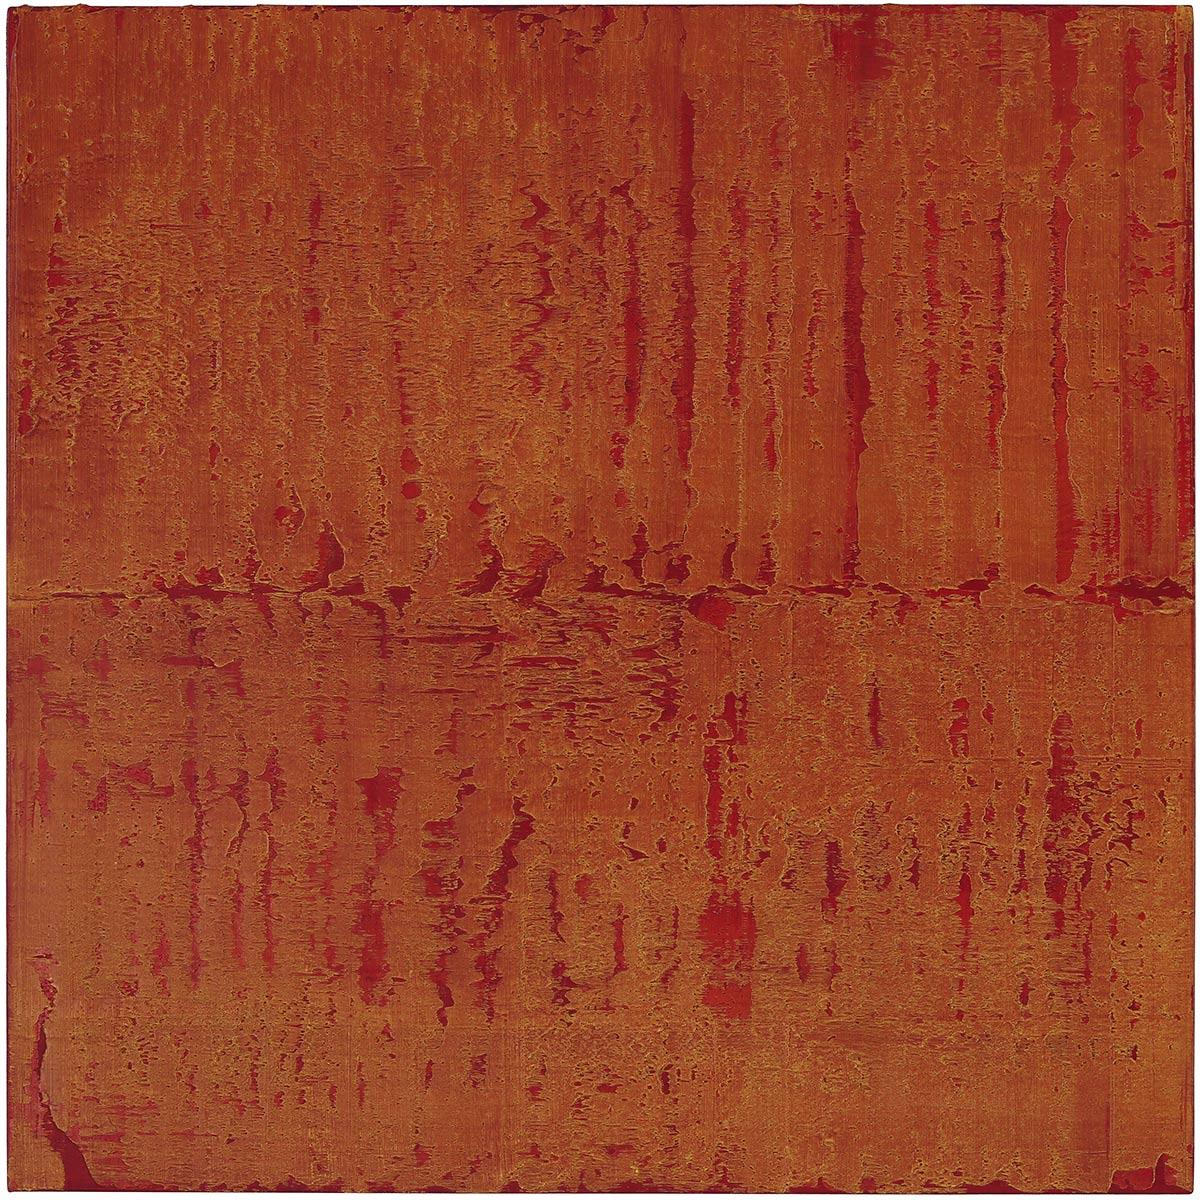 Michael Kravagna | Oil Pigments on Canvas 2017-2018 | 2. Turn | Galerie3 Velden